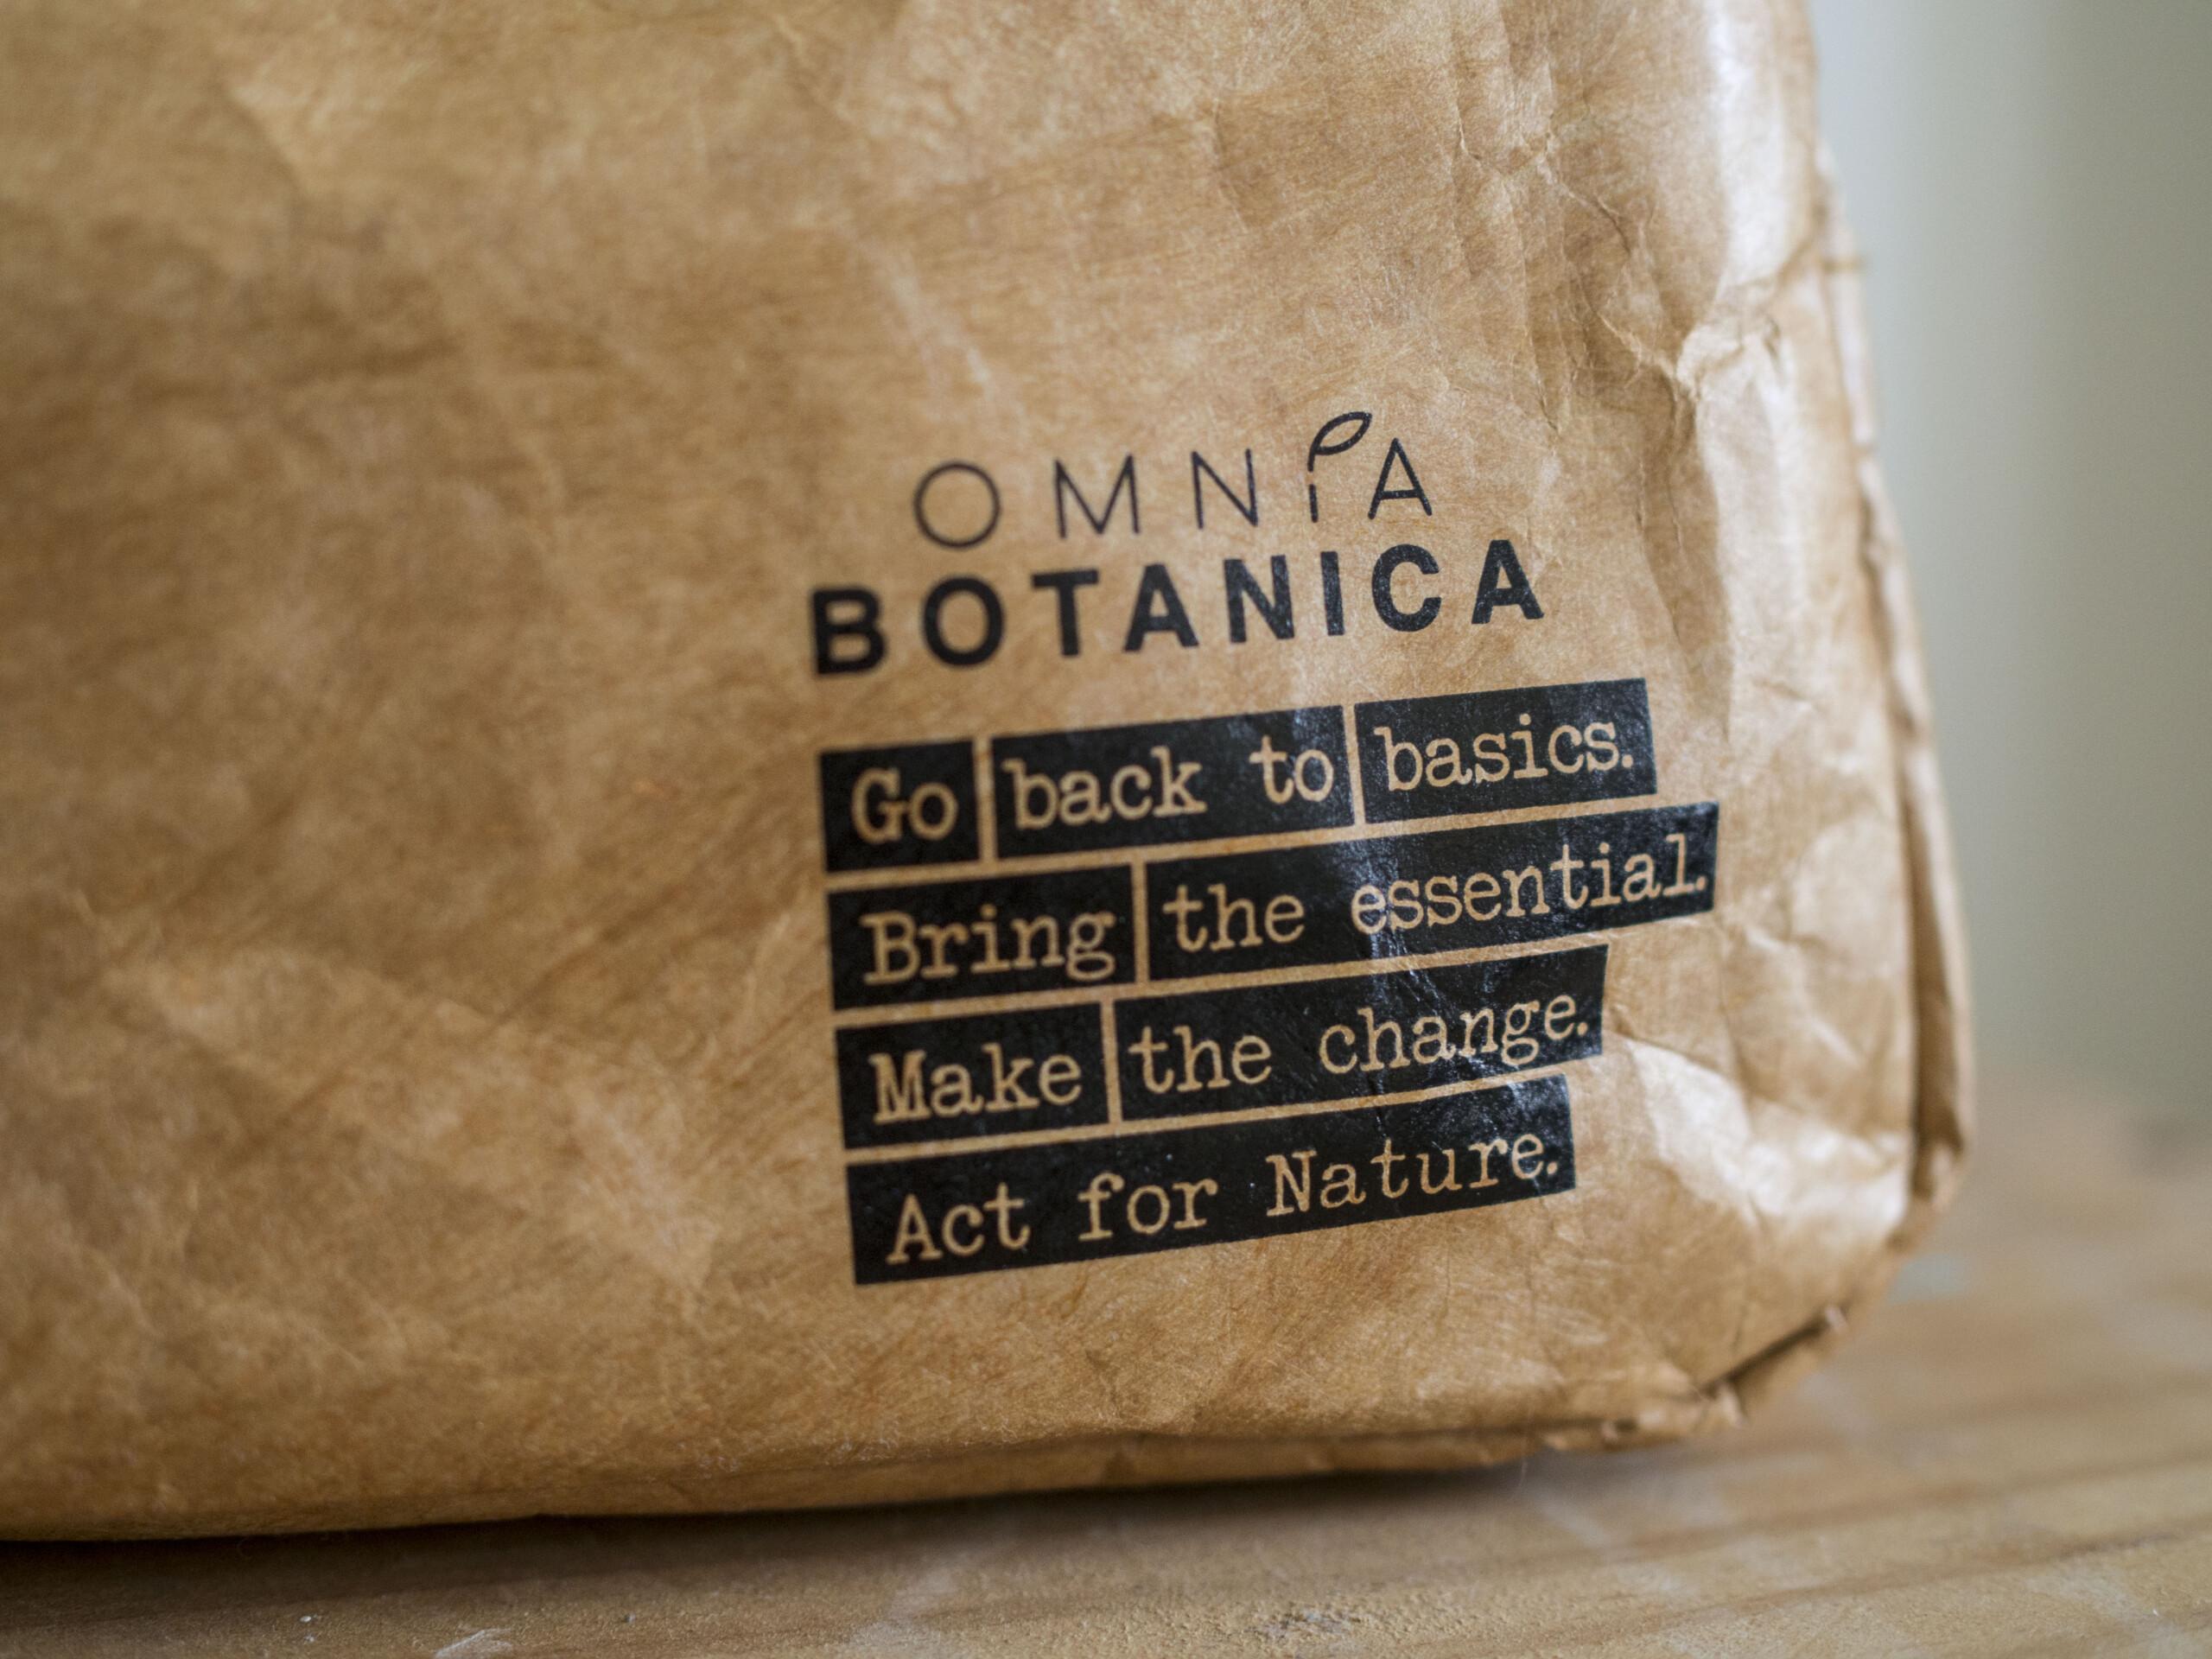 Omnia Botanica trousse de toilette voyage